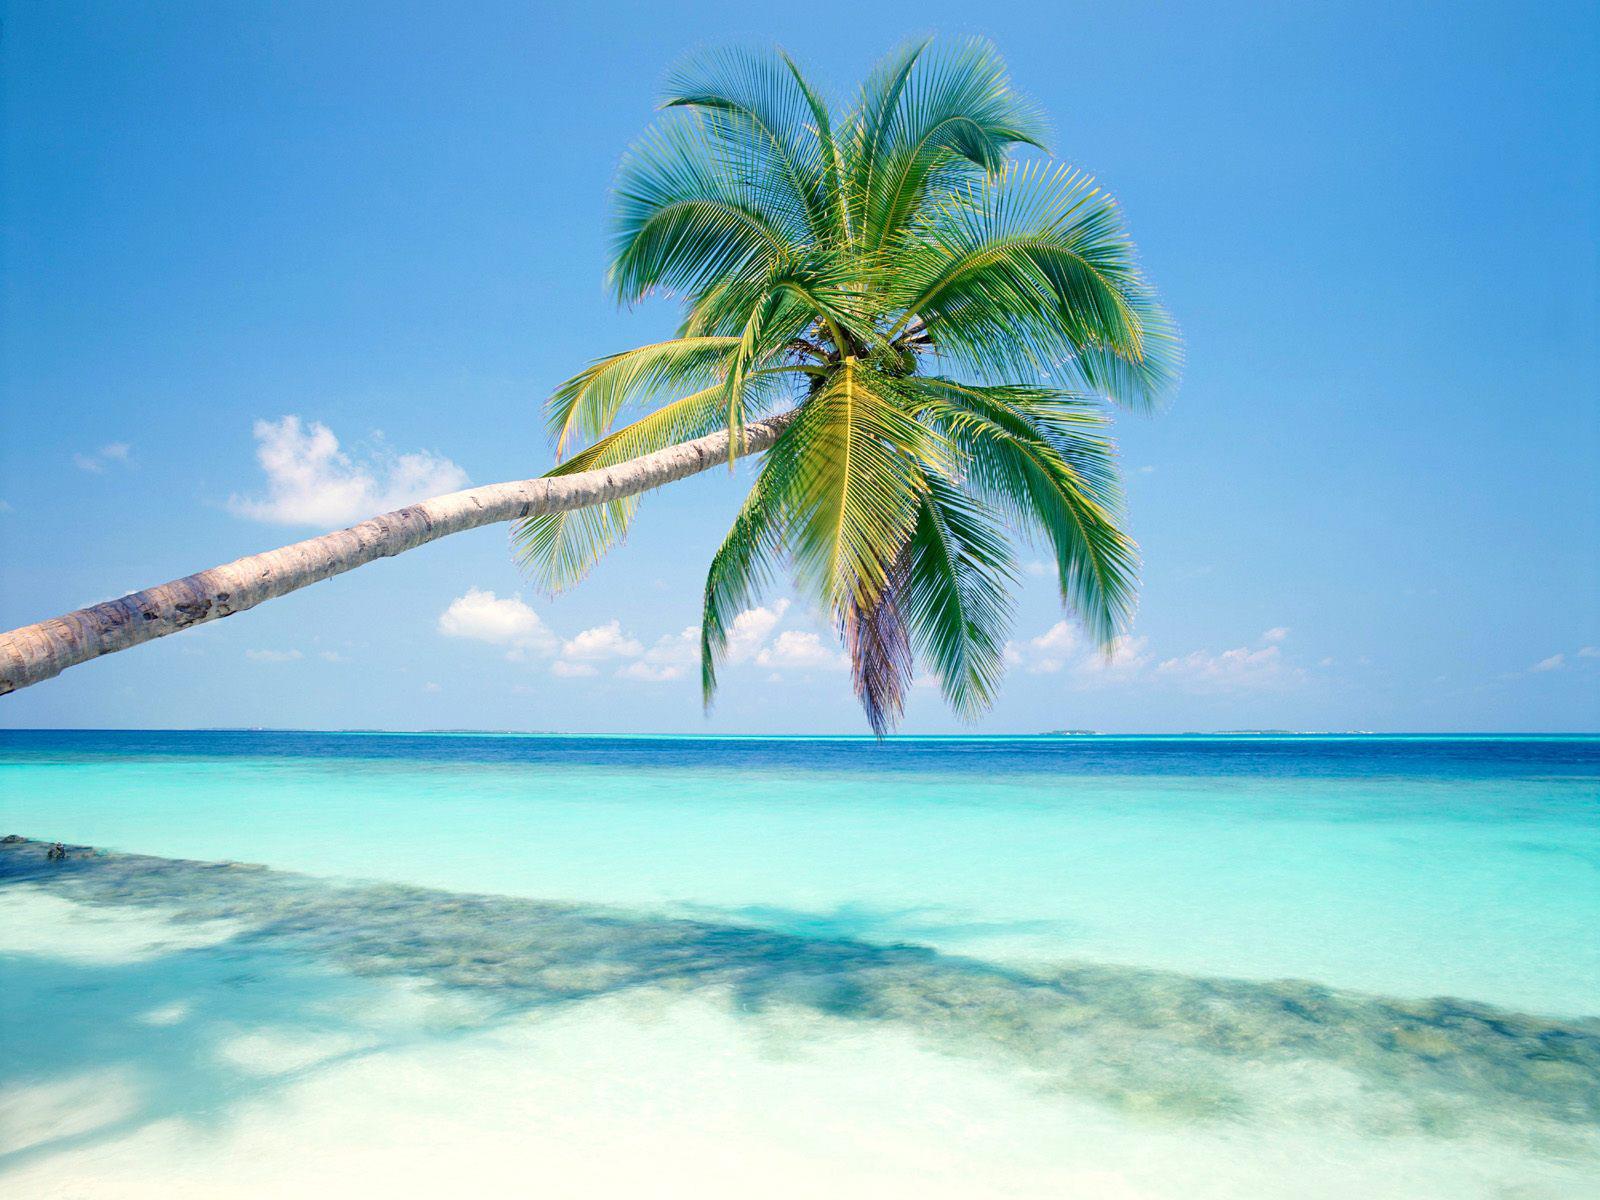 com Tropical Beach With Palm Tree computer desktop wallpaper 1600x1200